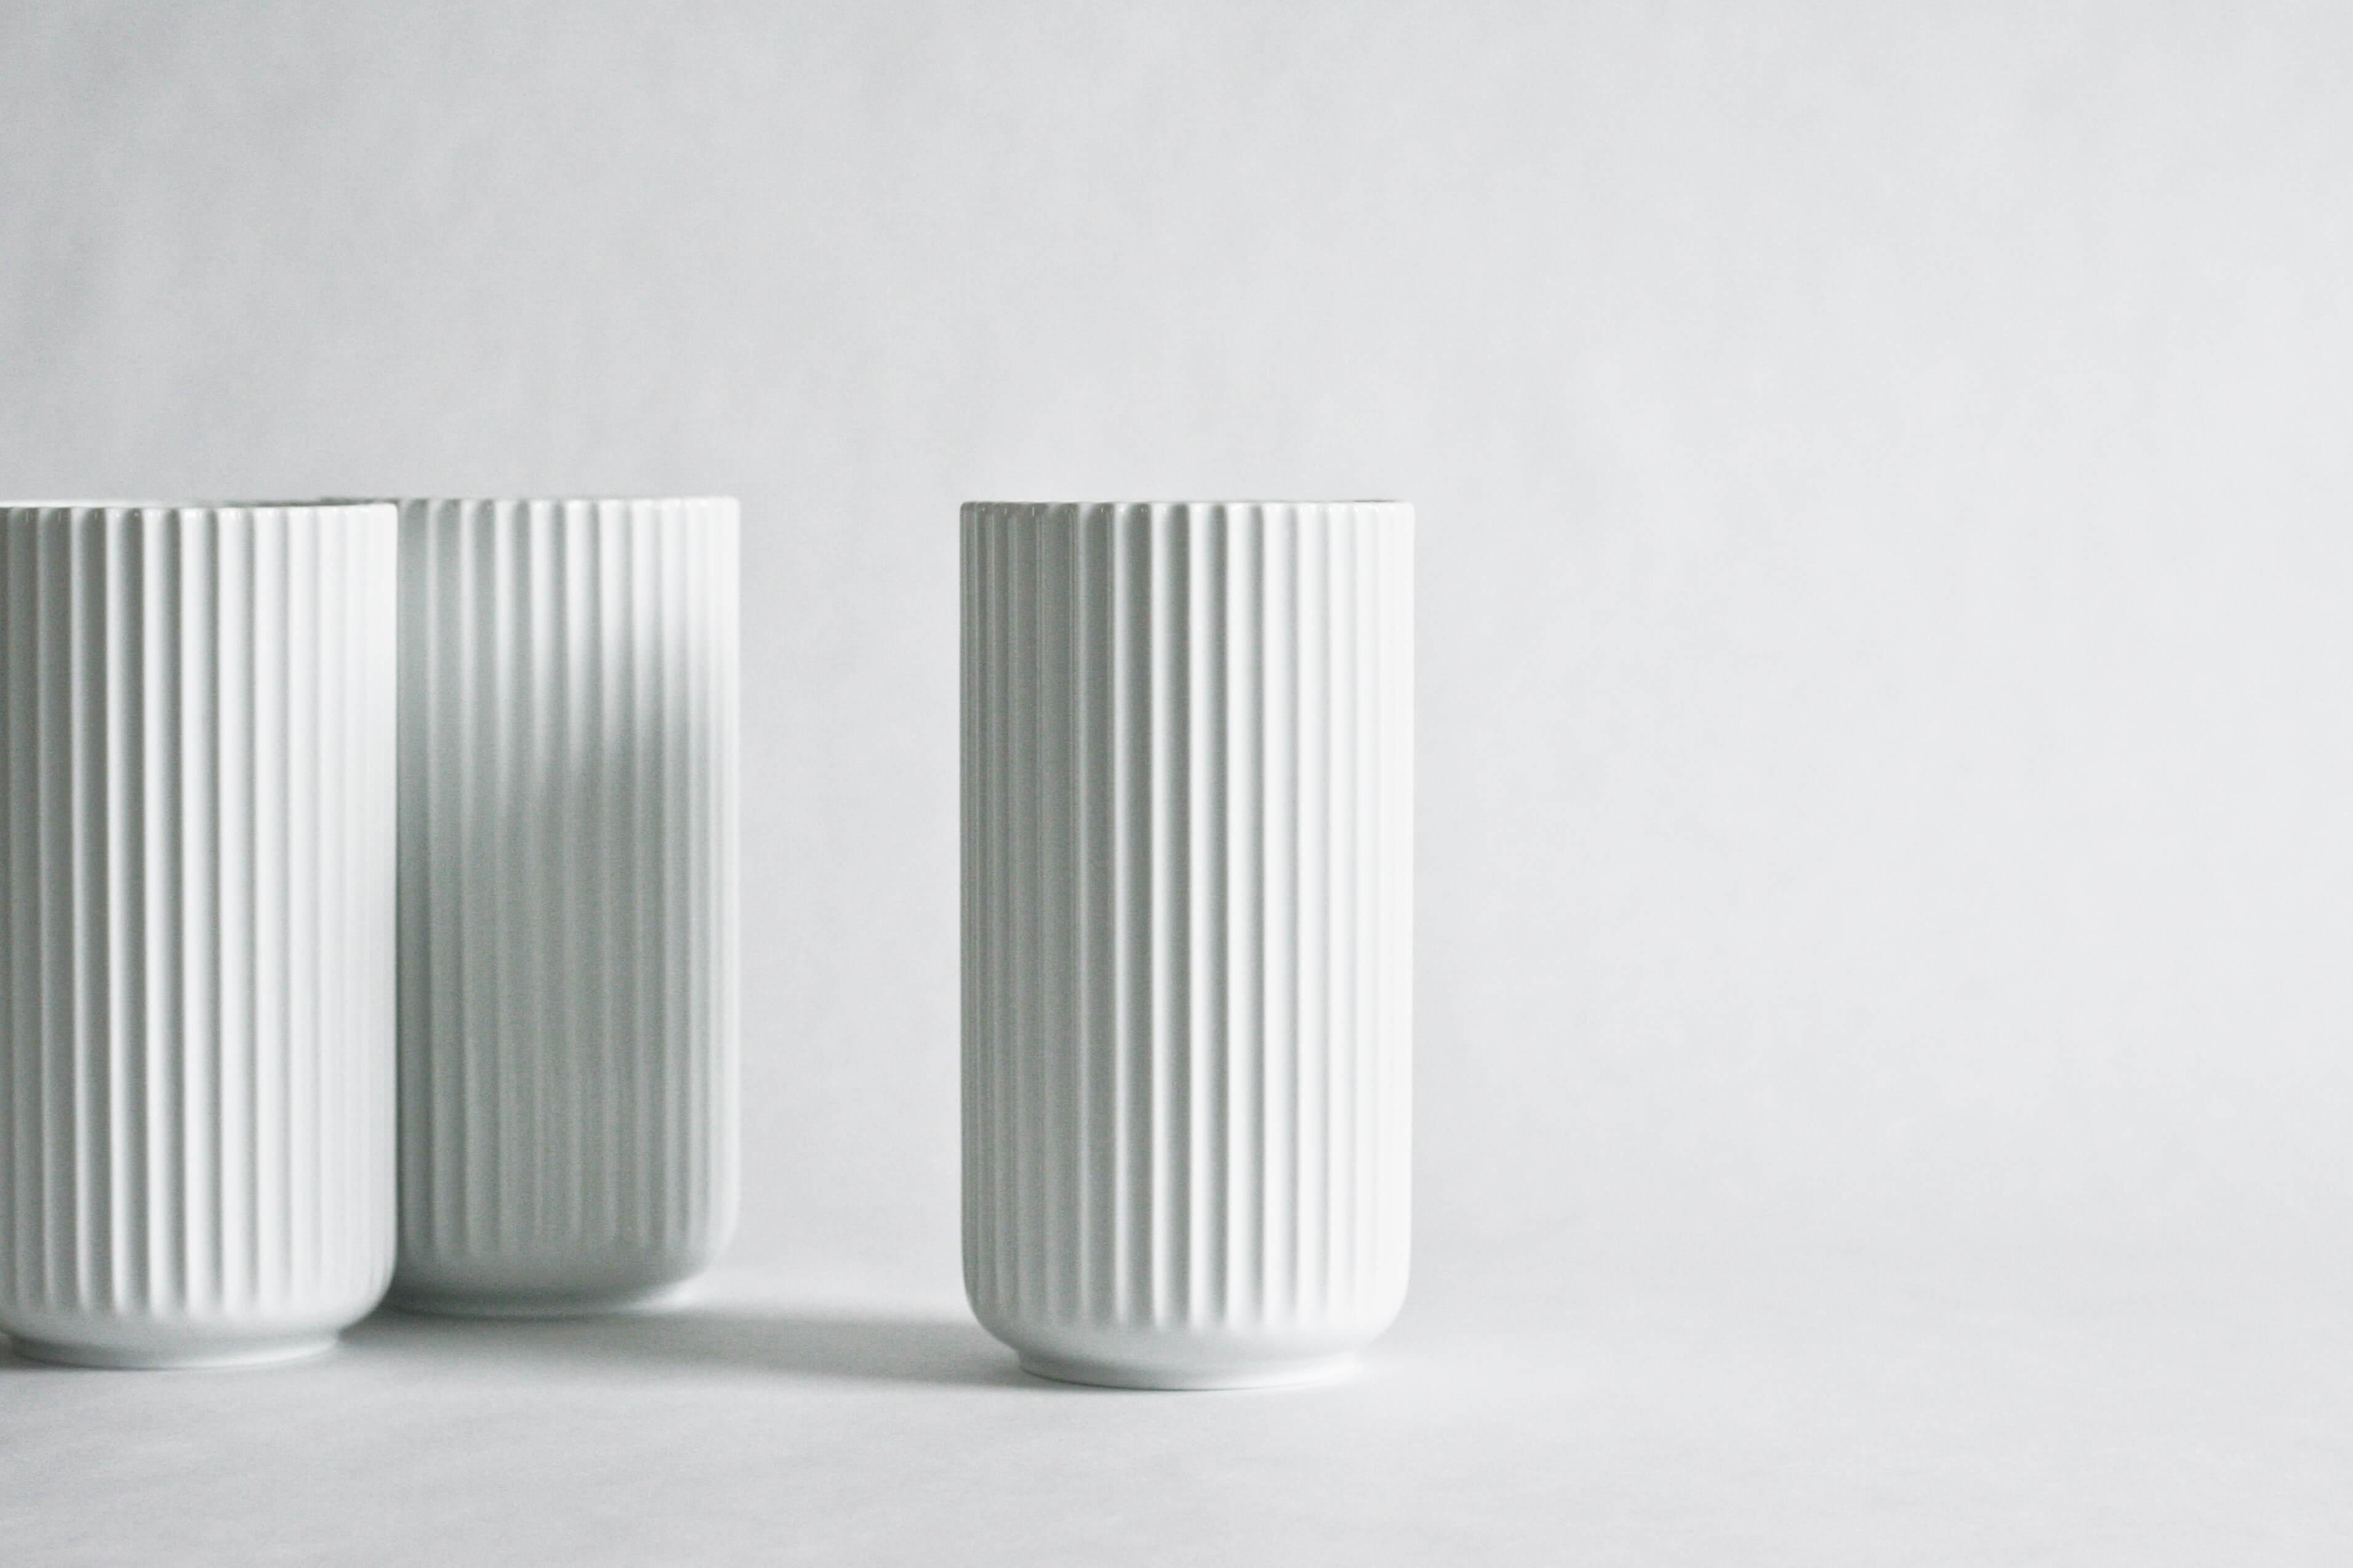 Lyngby Porcelæn_Lyngbyvasen_A table story